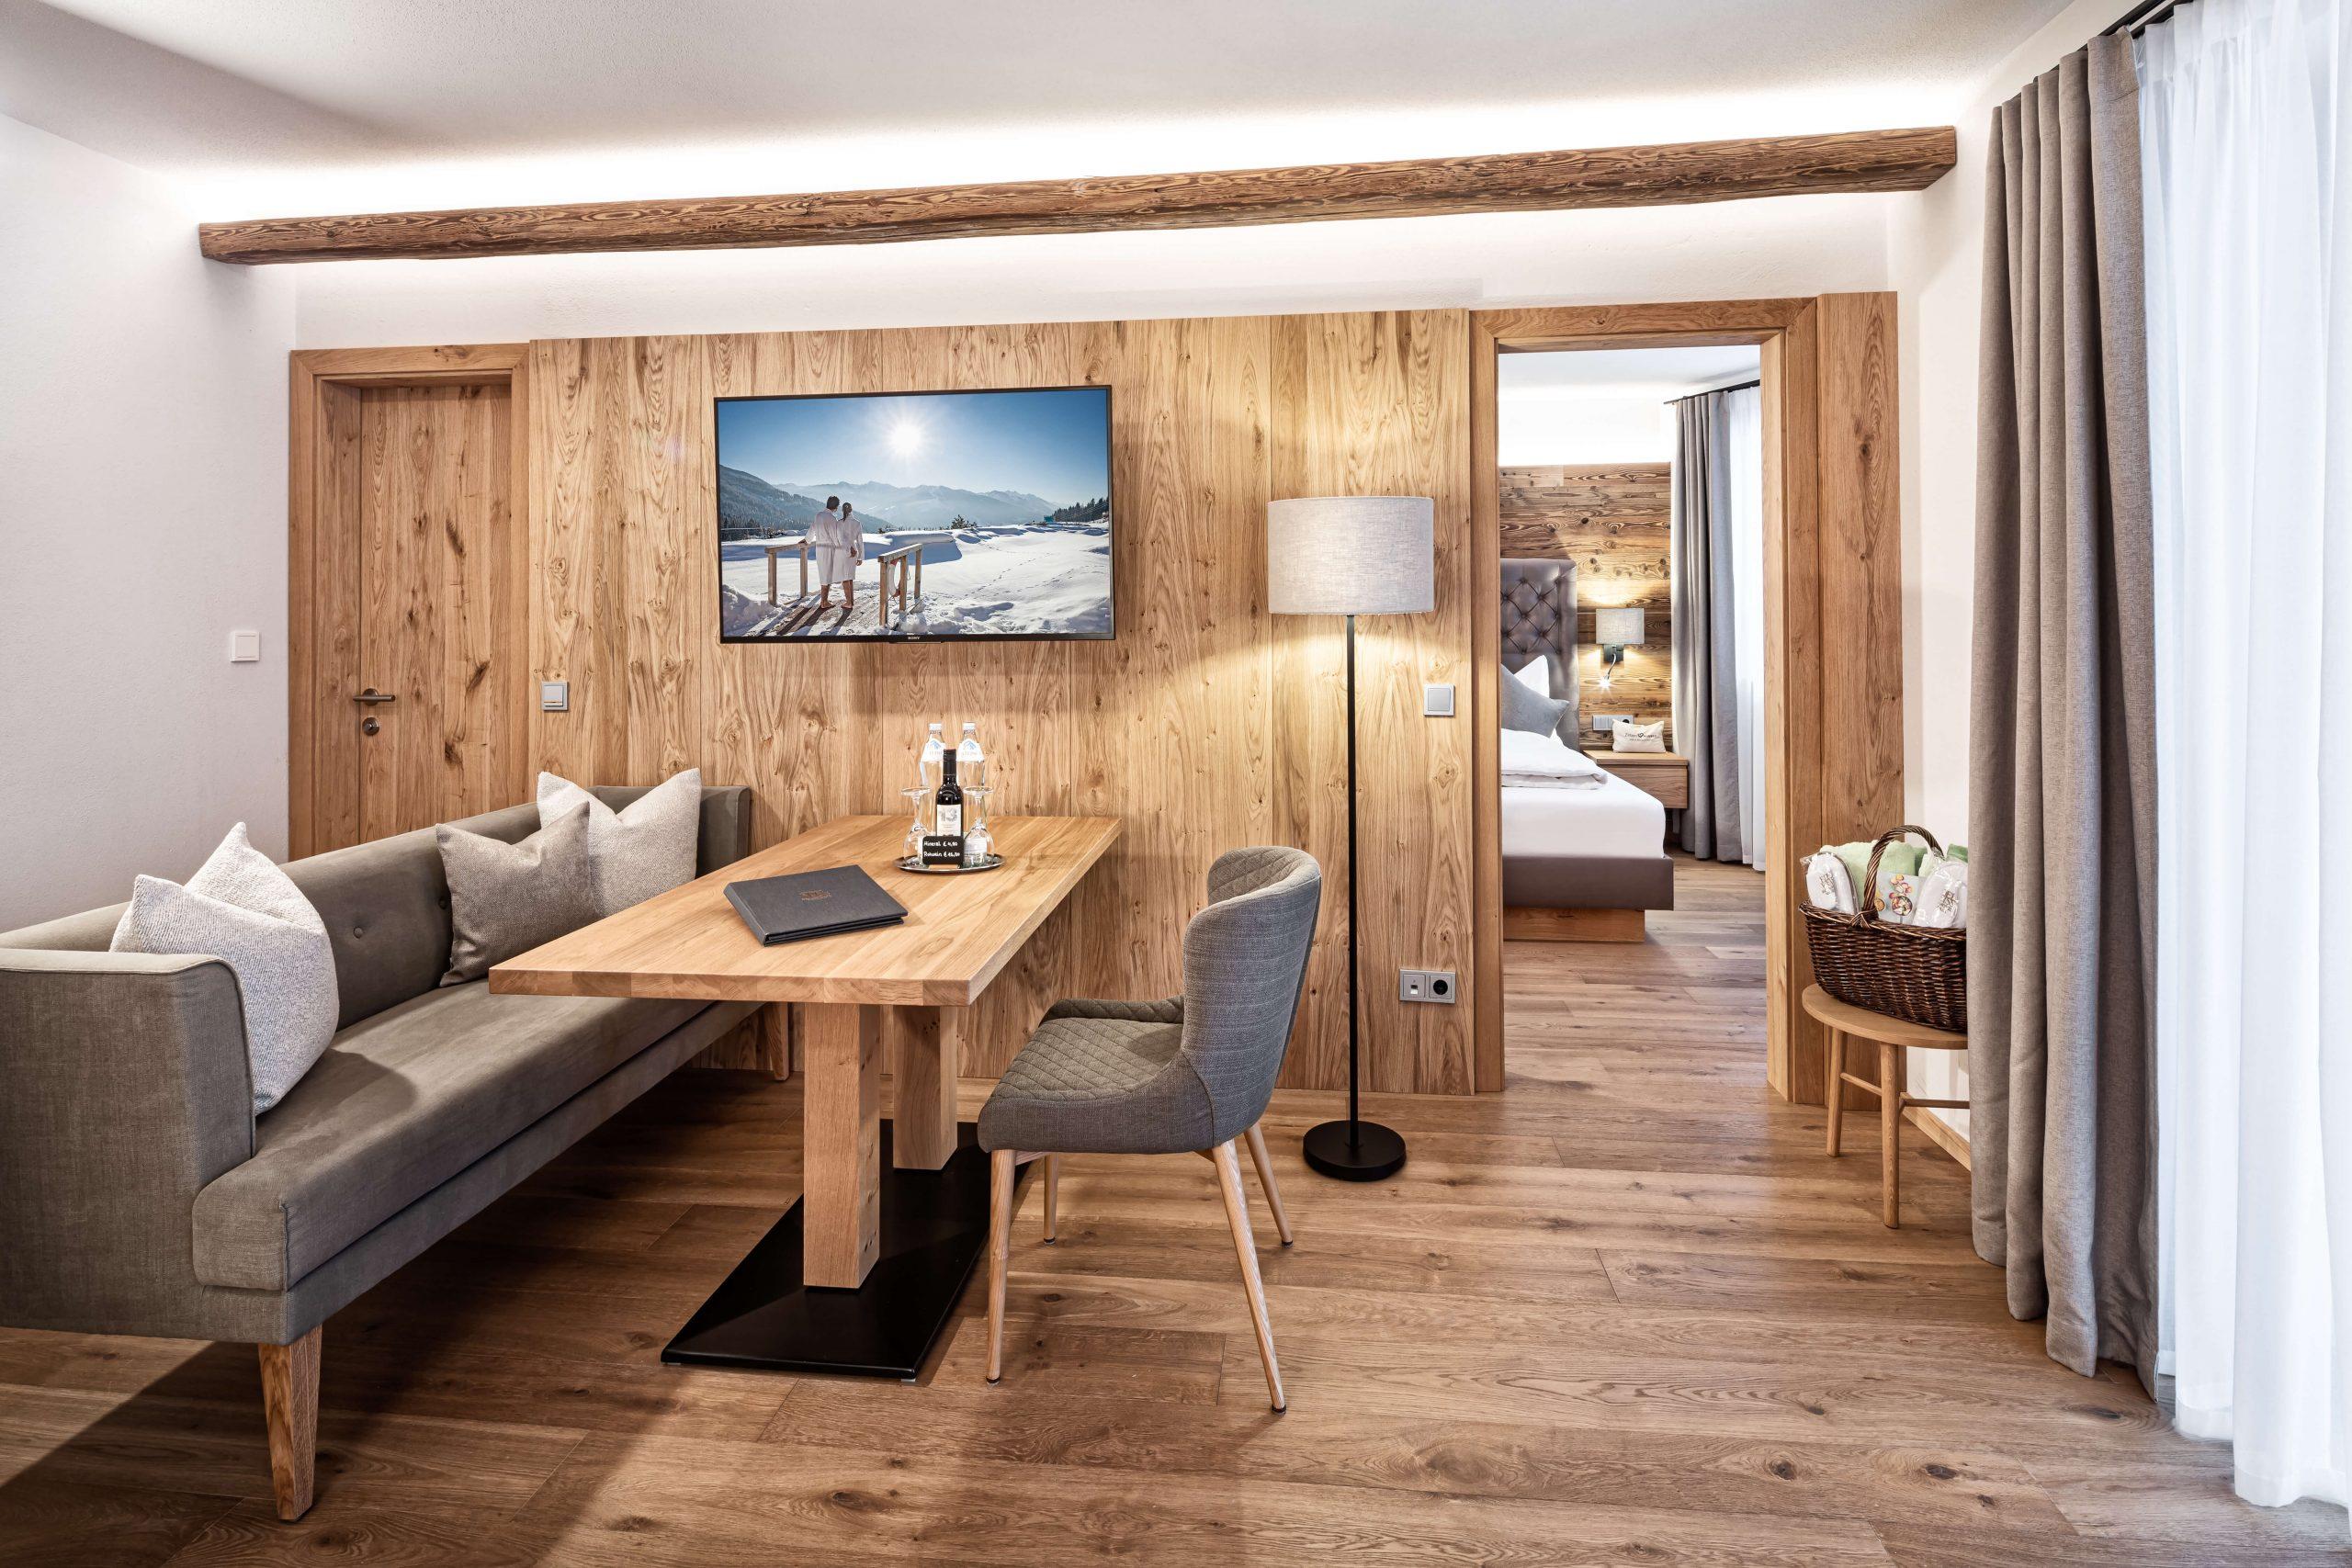 Suite Alpenzauber im Naturidyll Hotel Edelweiss Wagrain